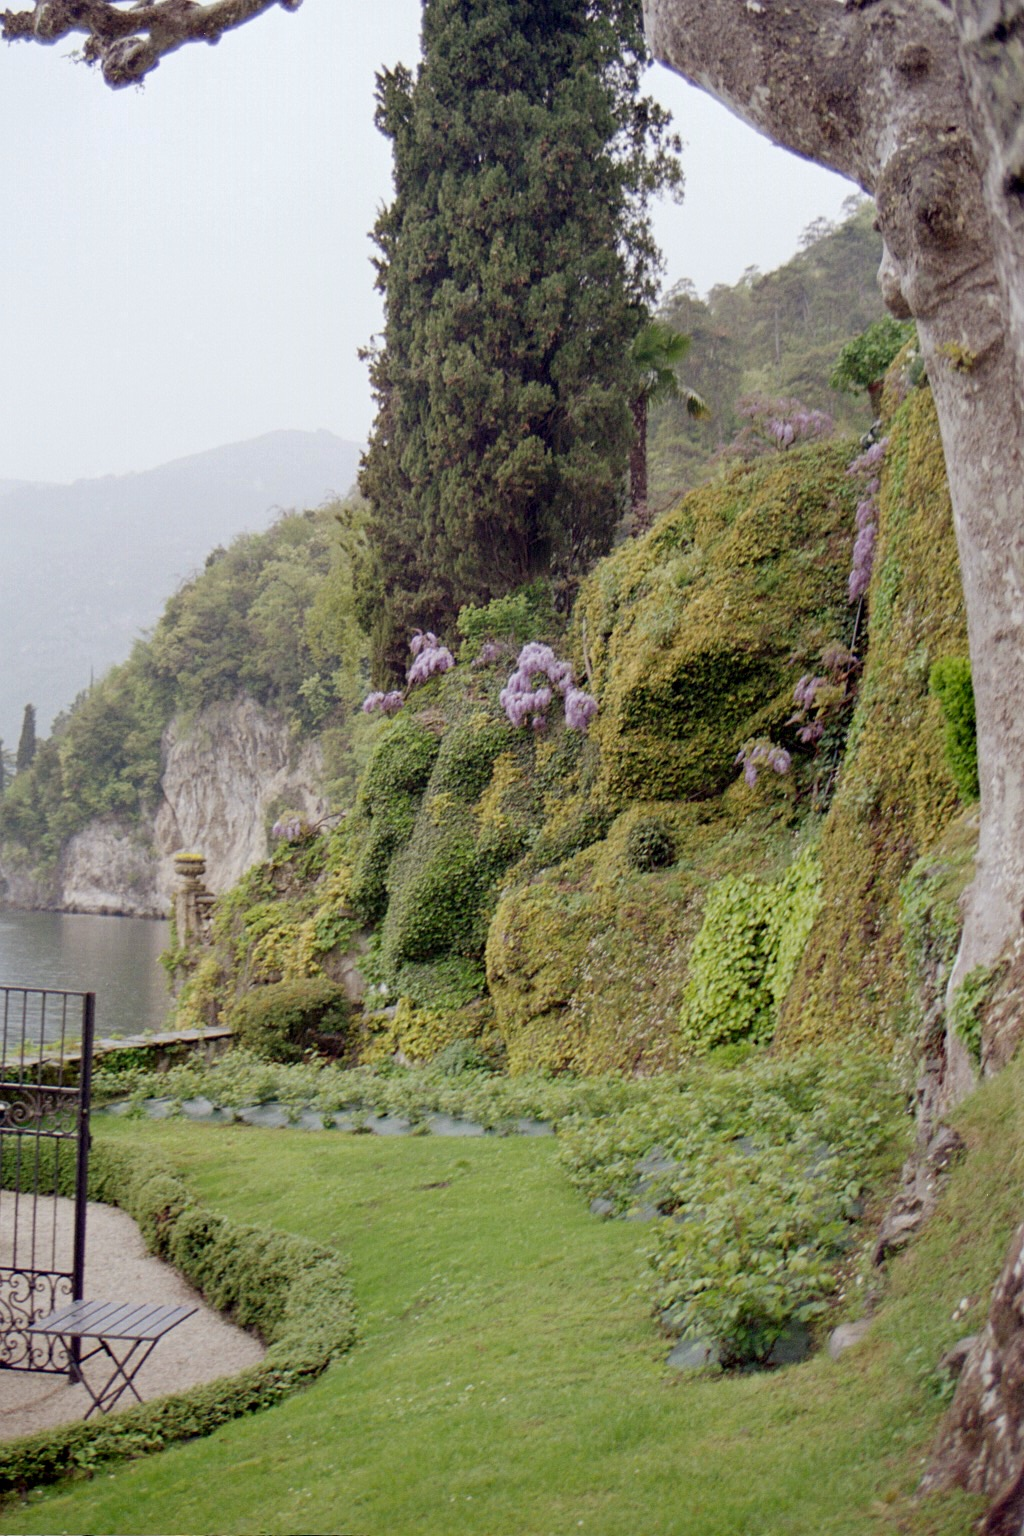 Villa Balbianello walkway